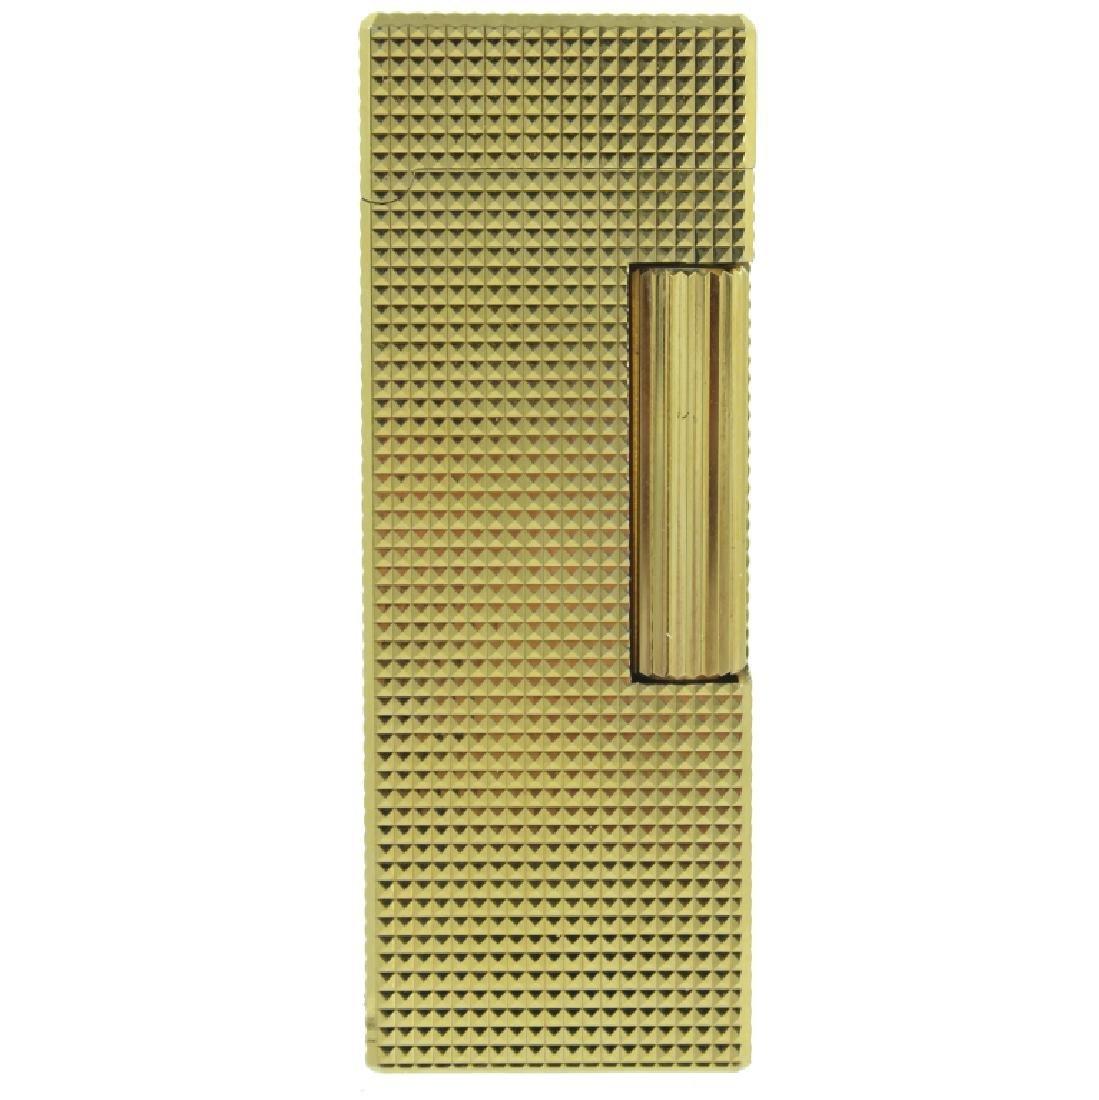 Tiffany & co. Rollagas Flint Lighter.